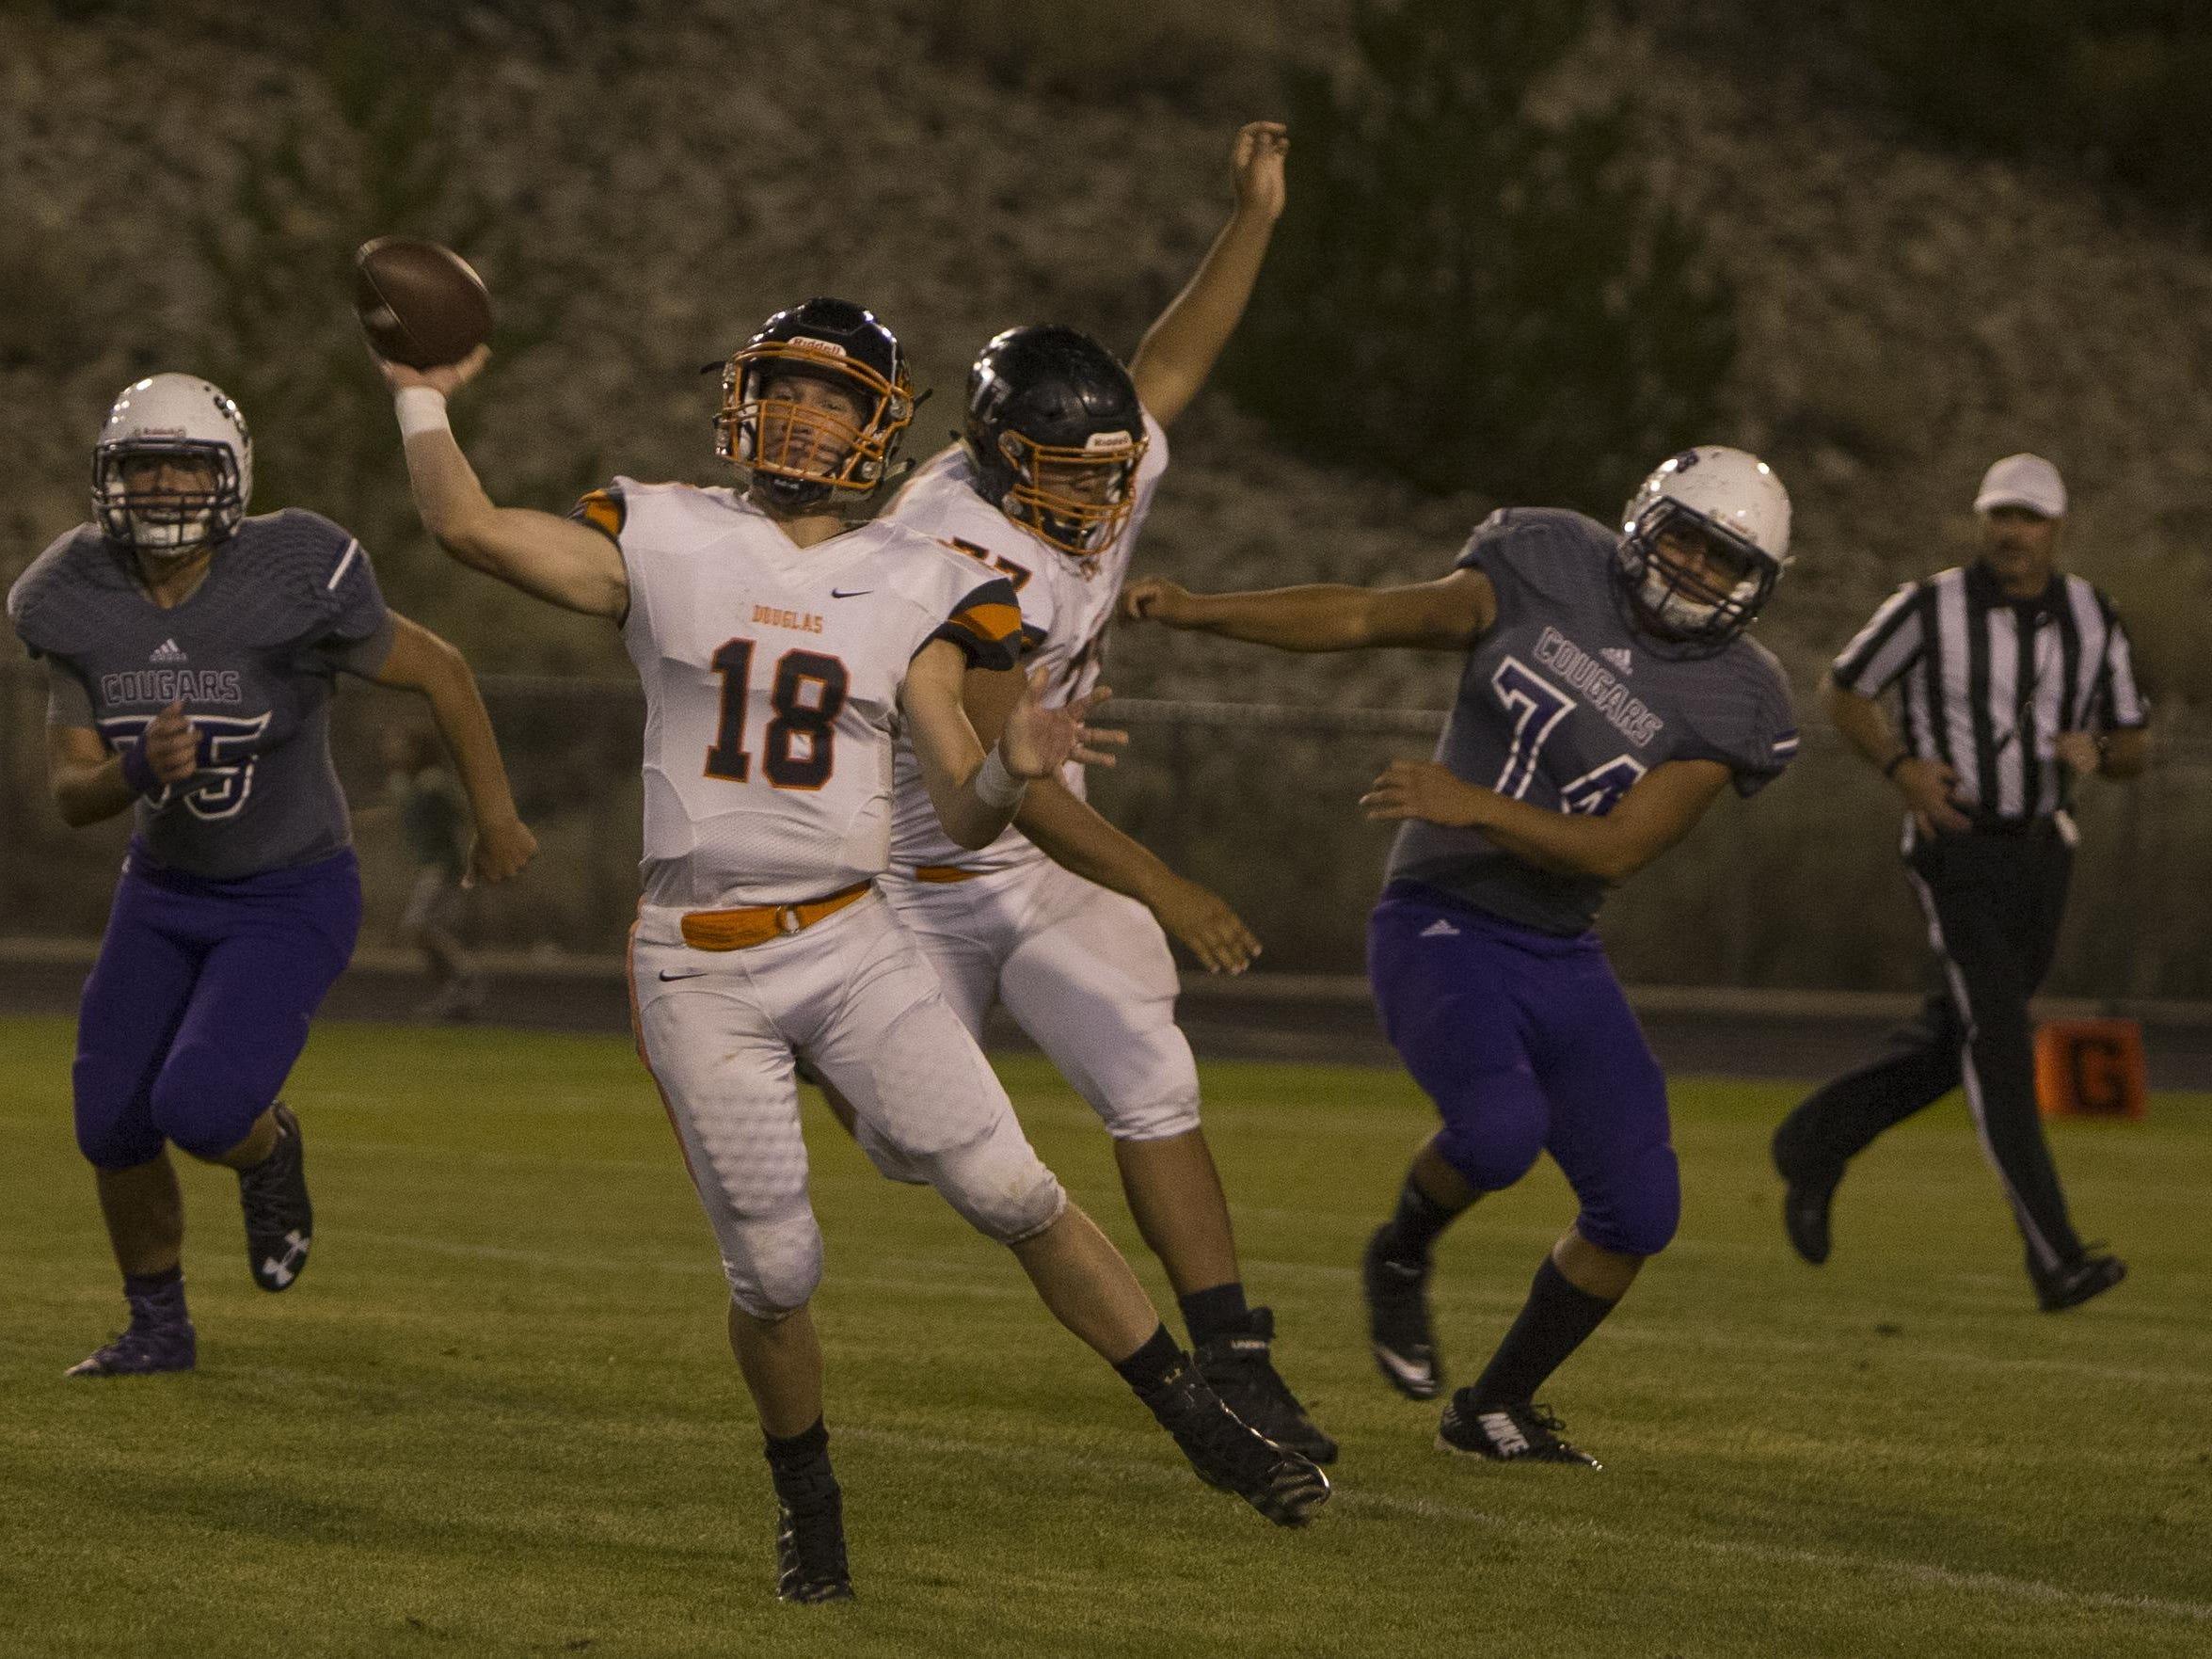 Douglas quarterback Hunter Hickey throws against Spanish Springs on Friday.